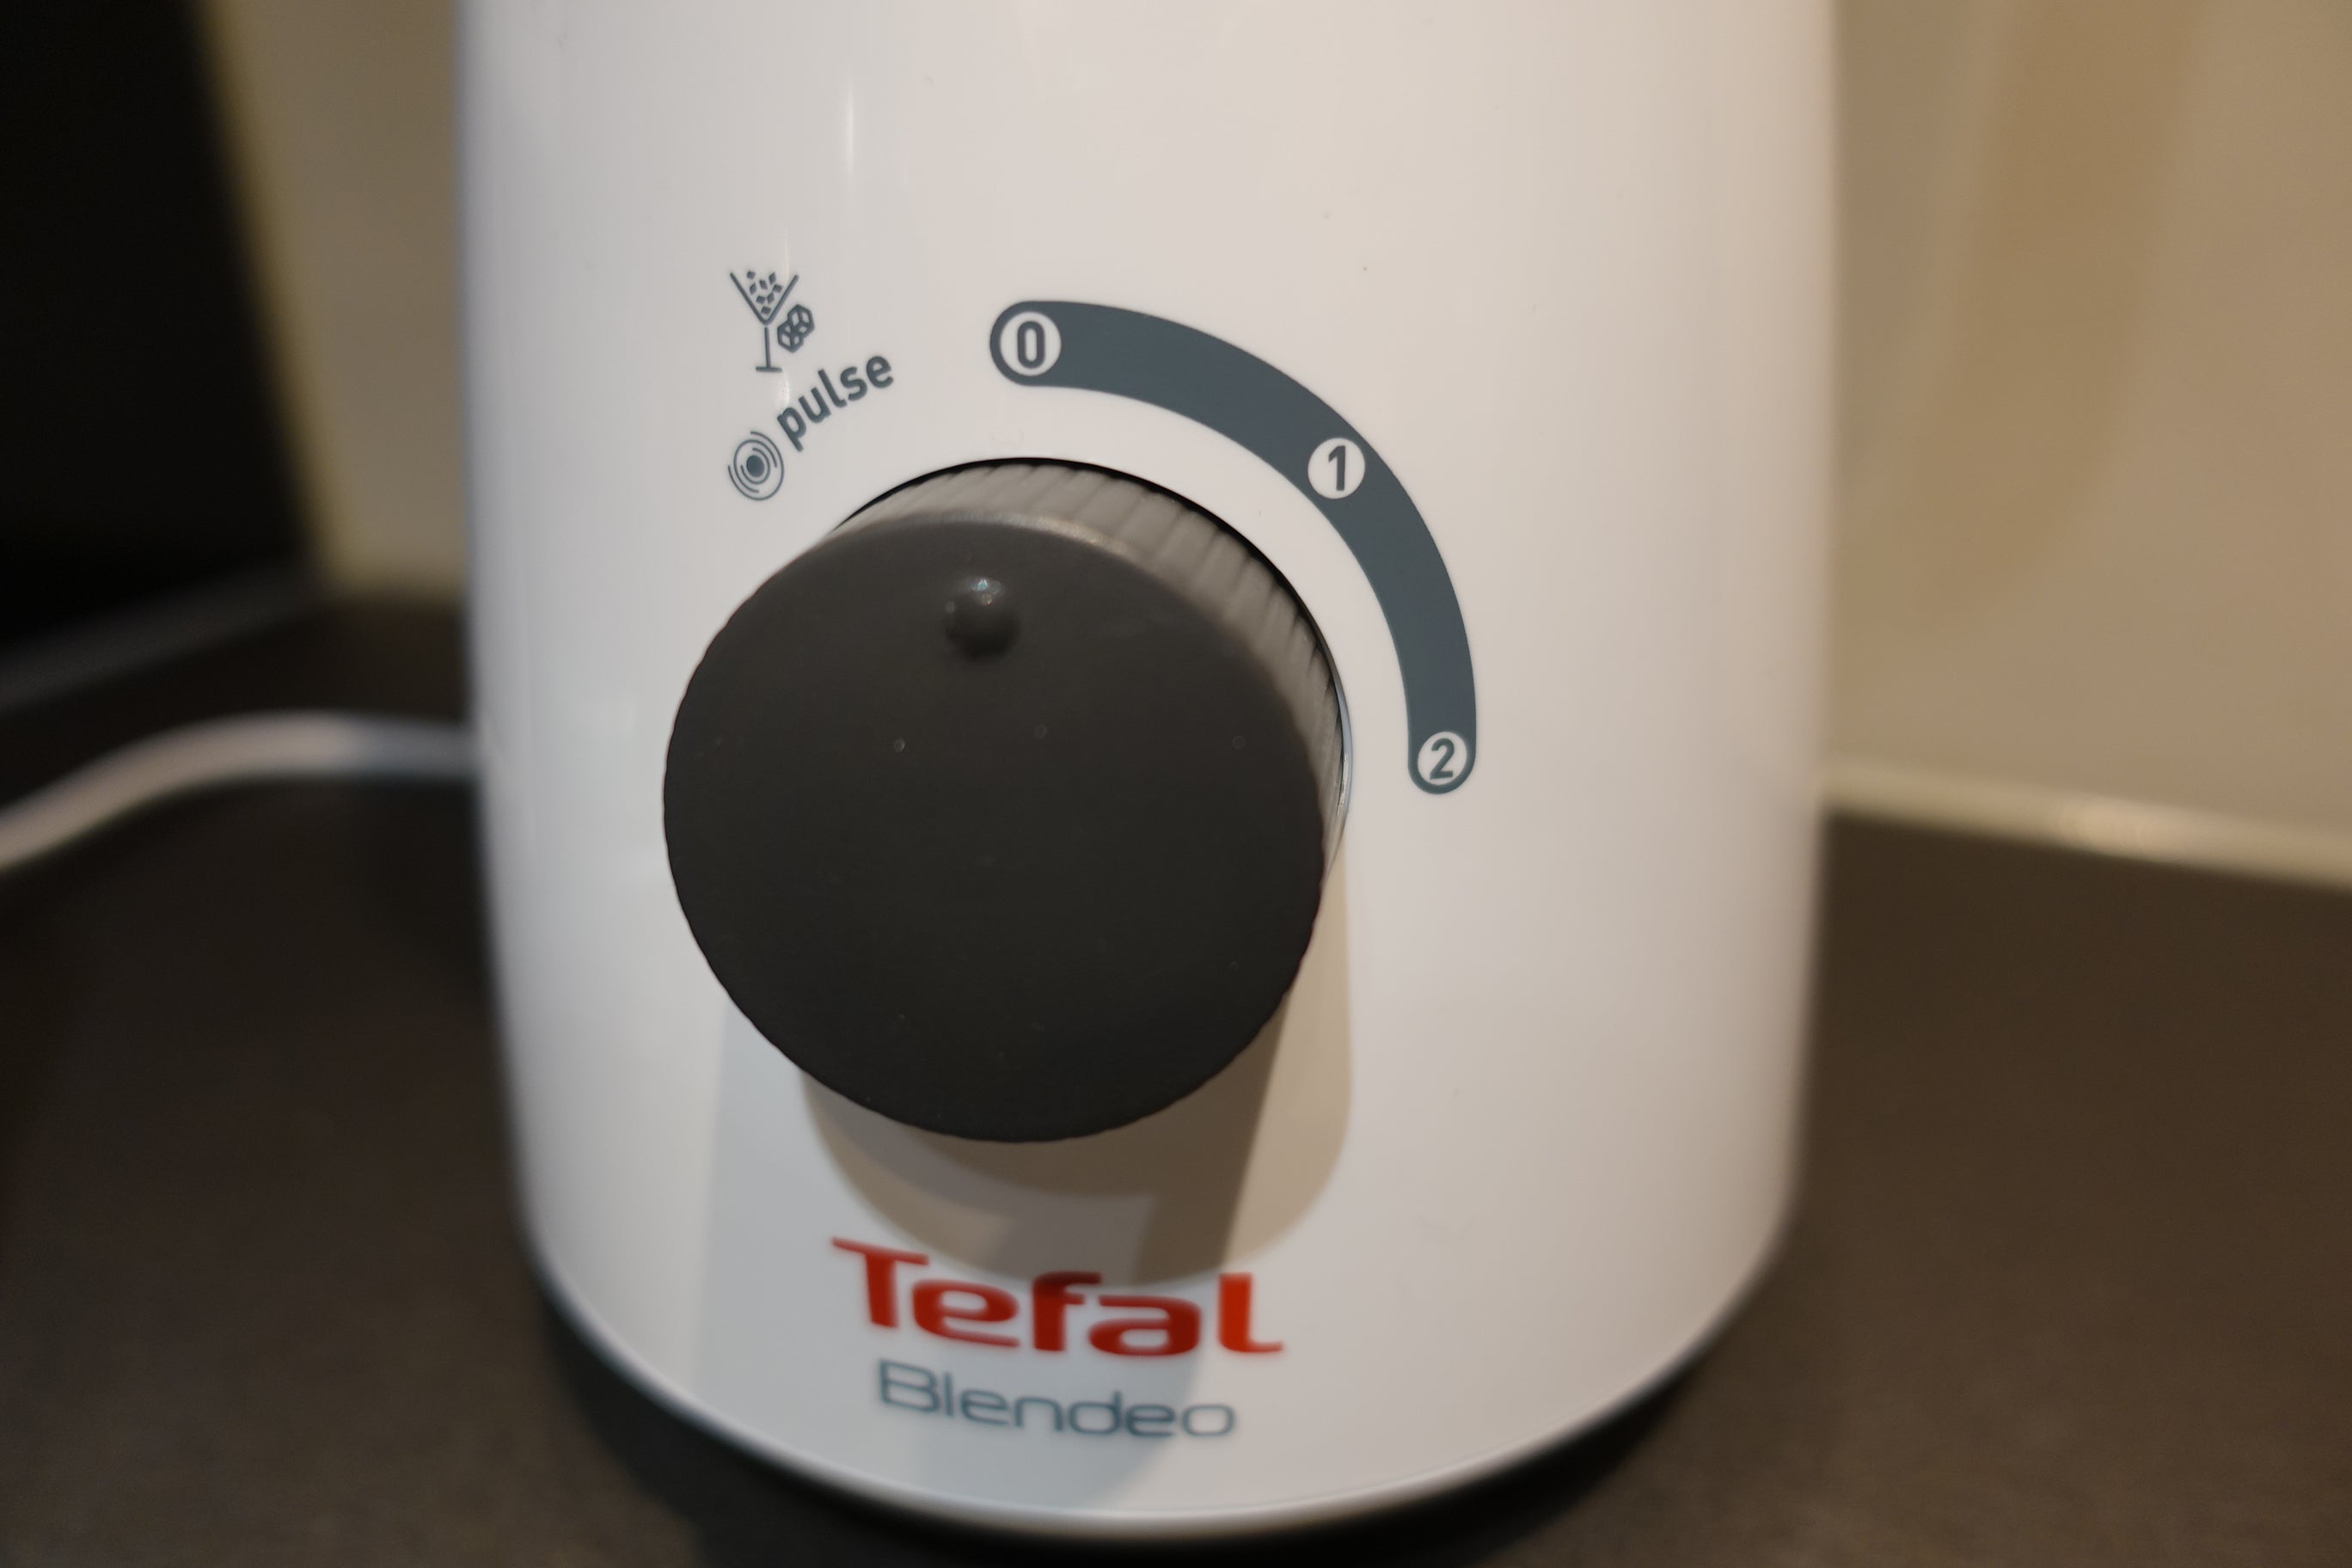 Tefal Blendeo BL2A3142 Blender controls